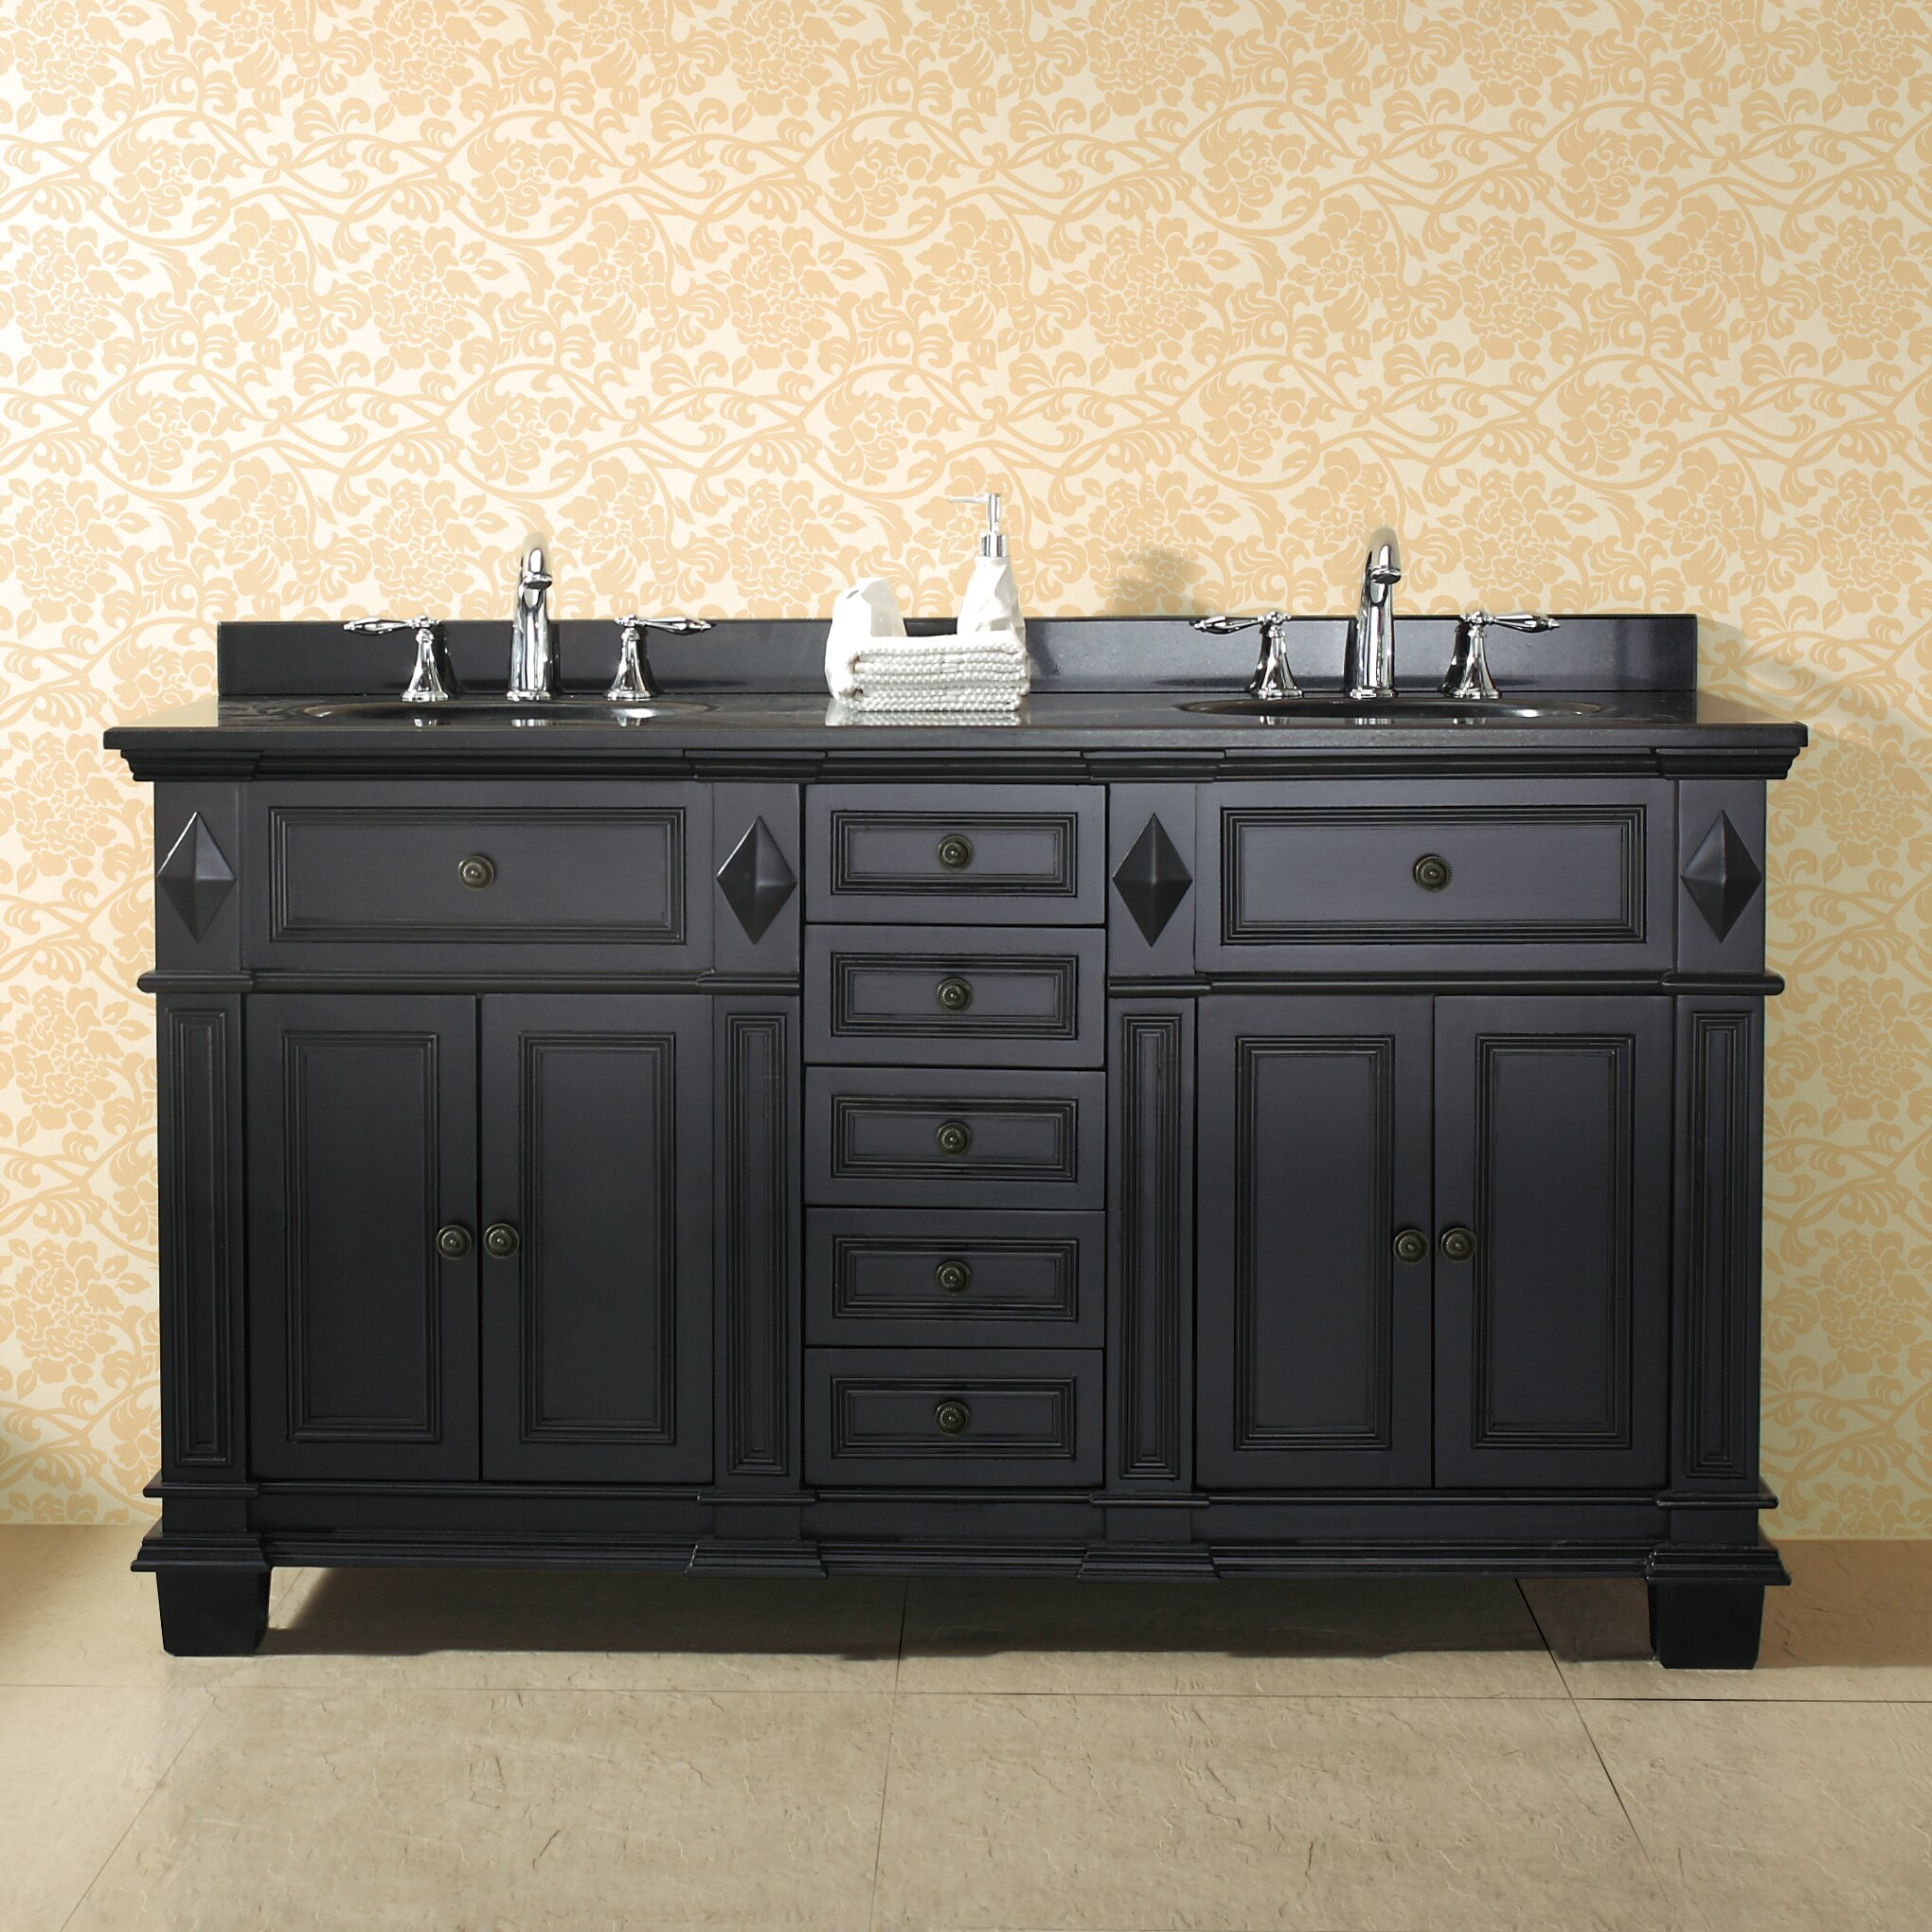 Ove decors essex 60 double bathroom vanity set reviews for Decor vanity